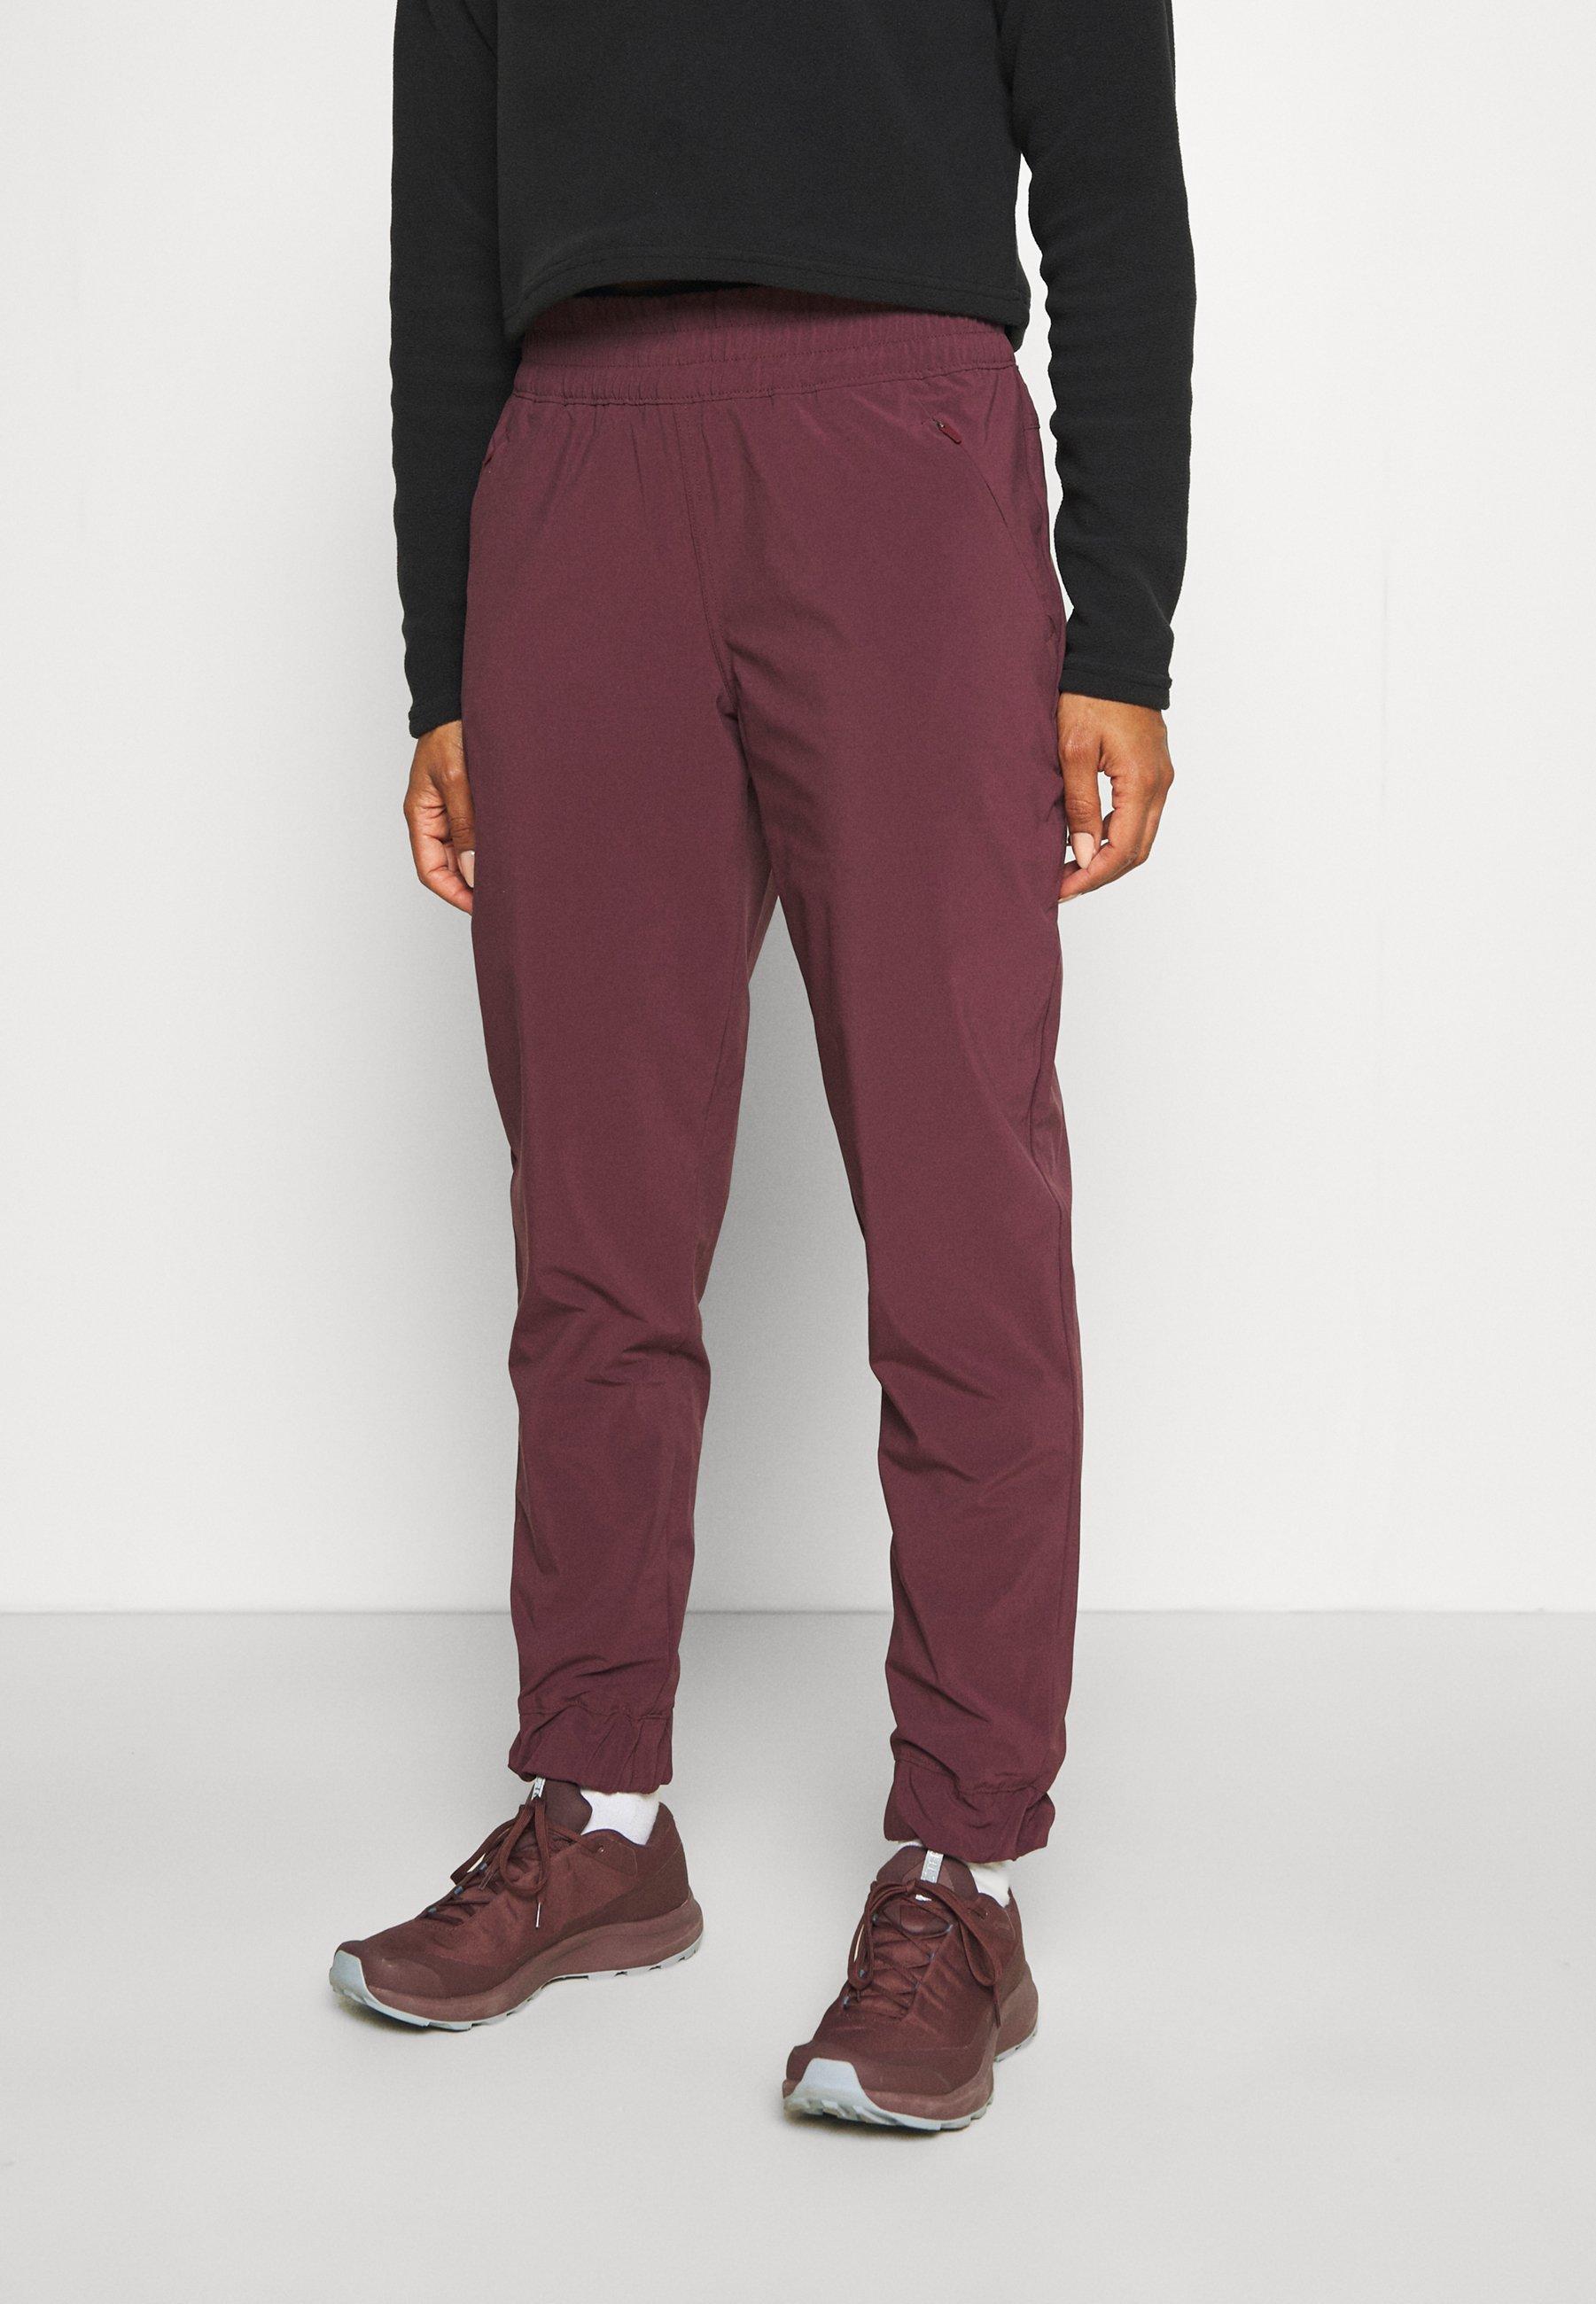 Donna PLEASANT CREEK™ WARM JOGGER - Pantaloni outdoor